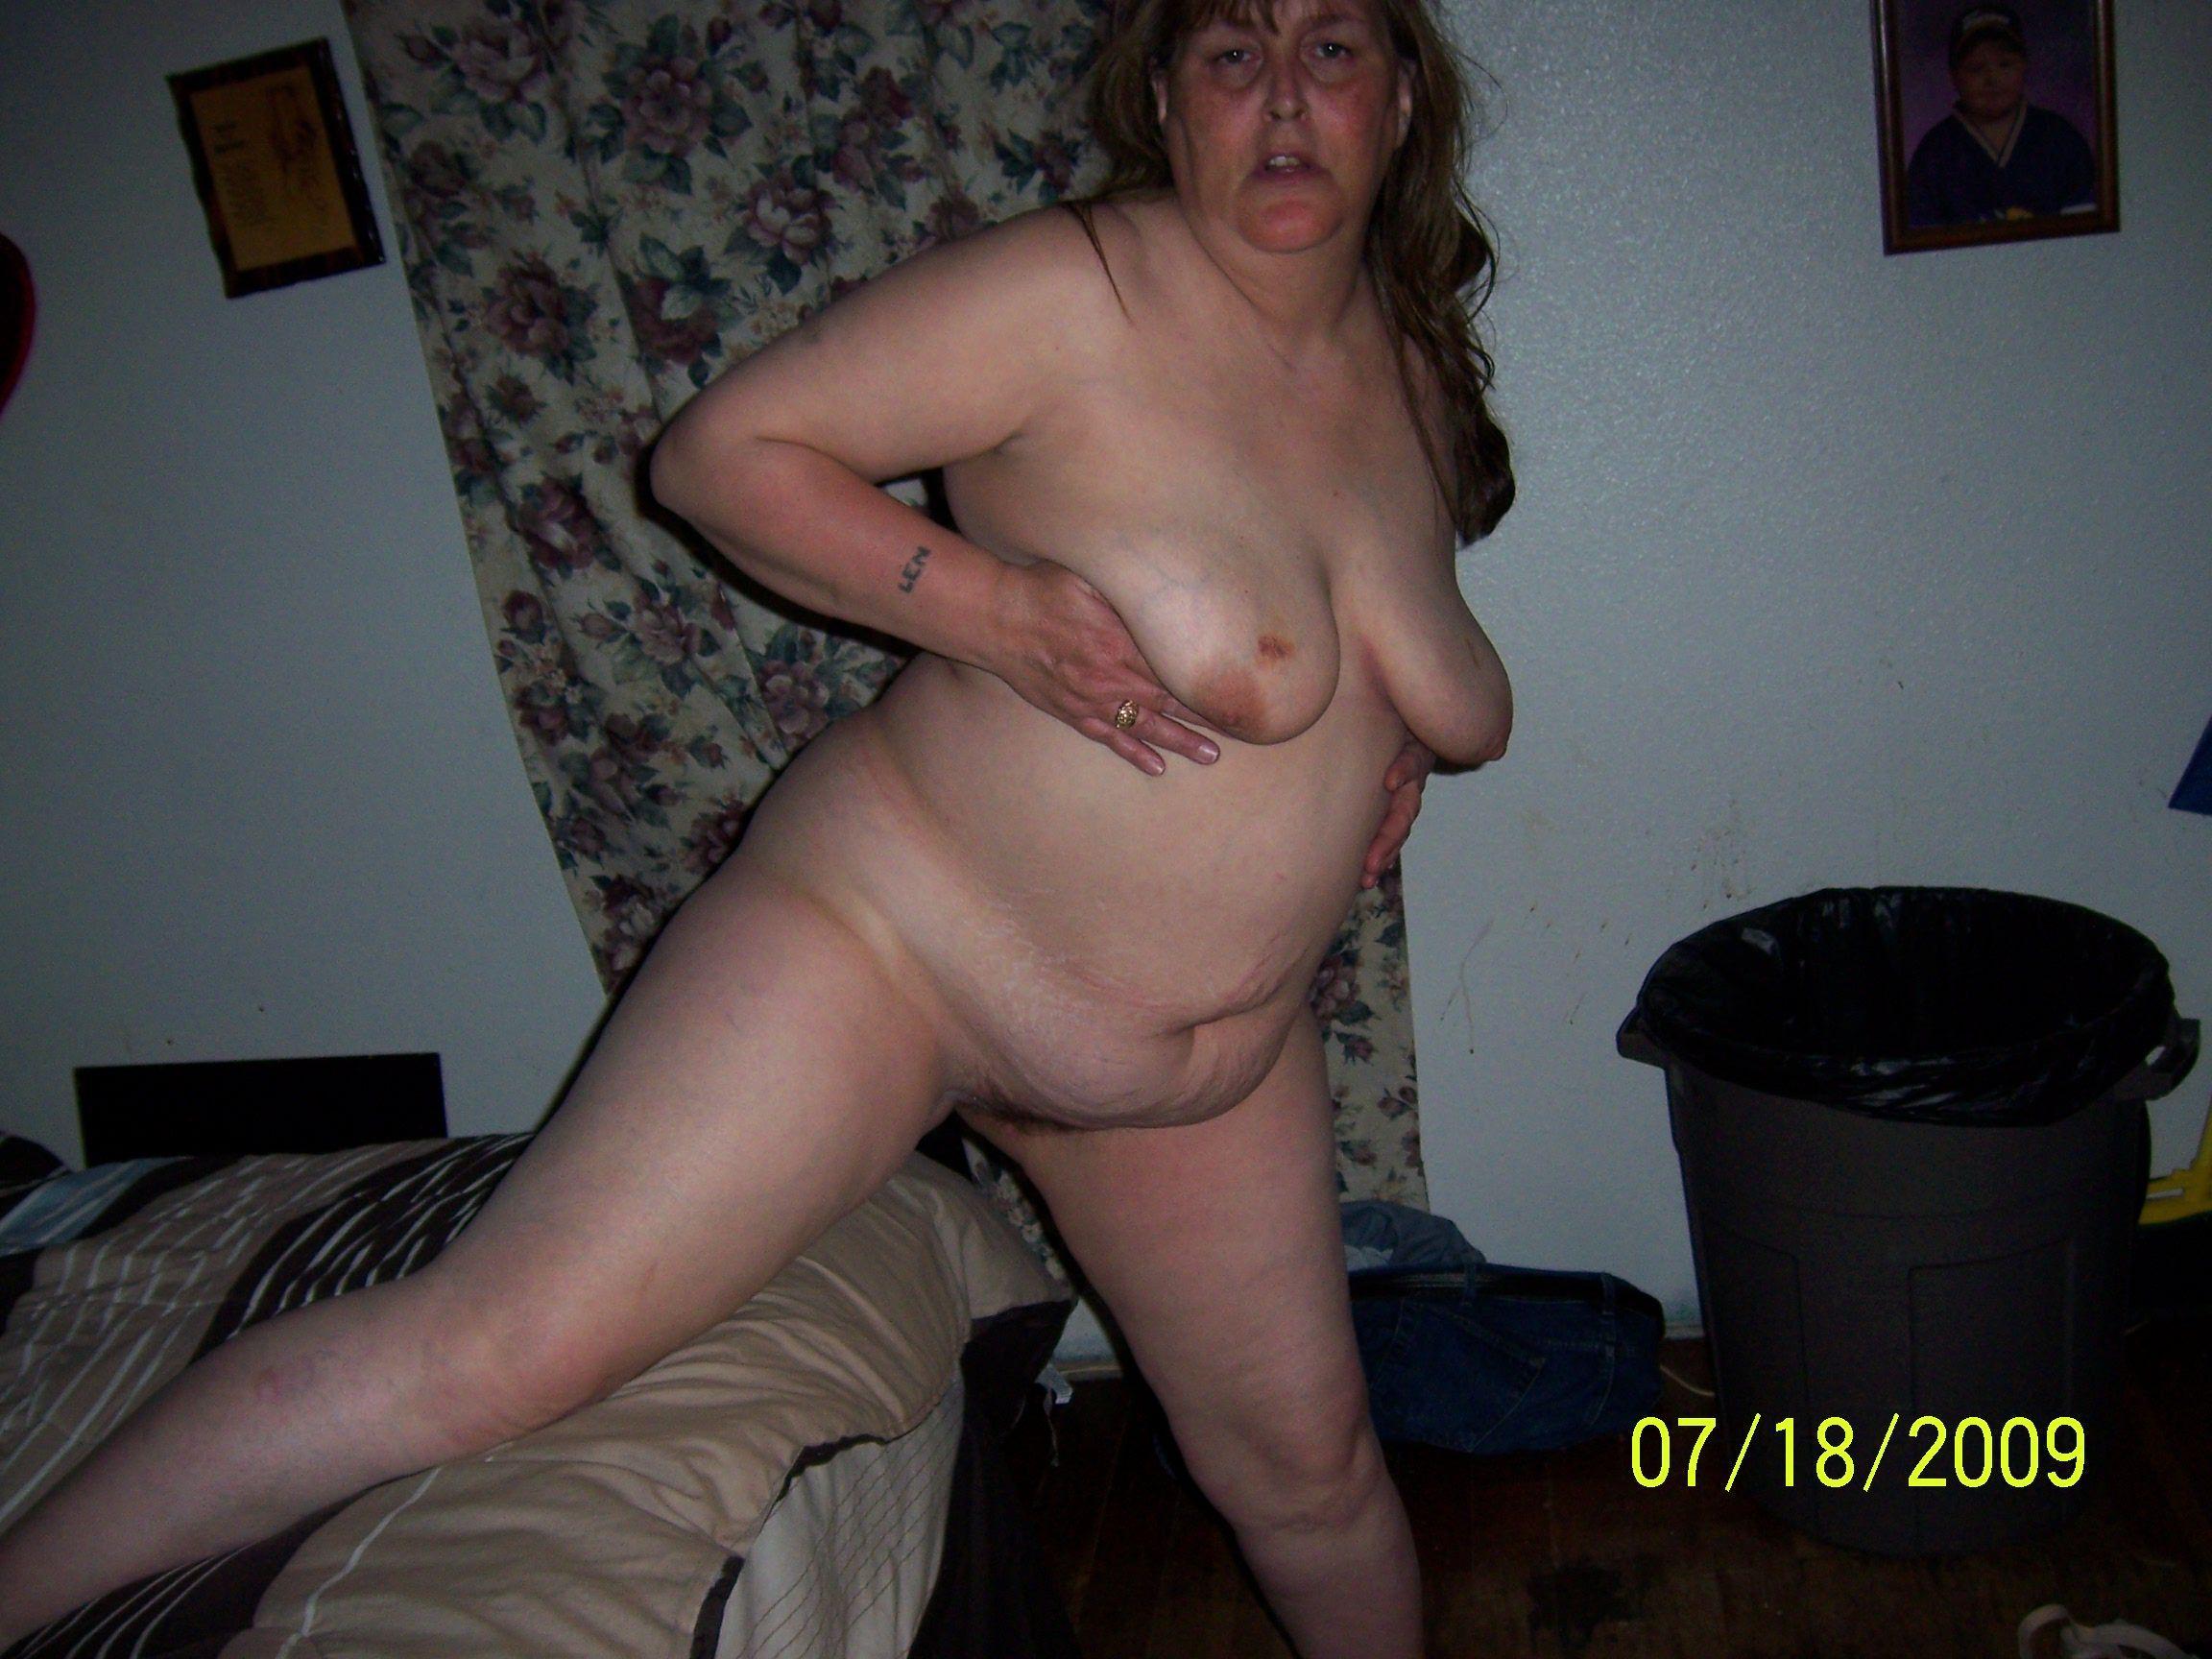 Whores sluts nude pussy women what phrase